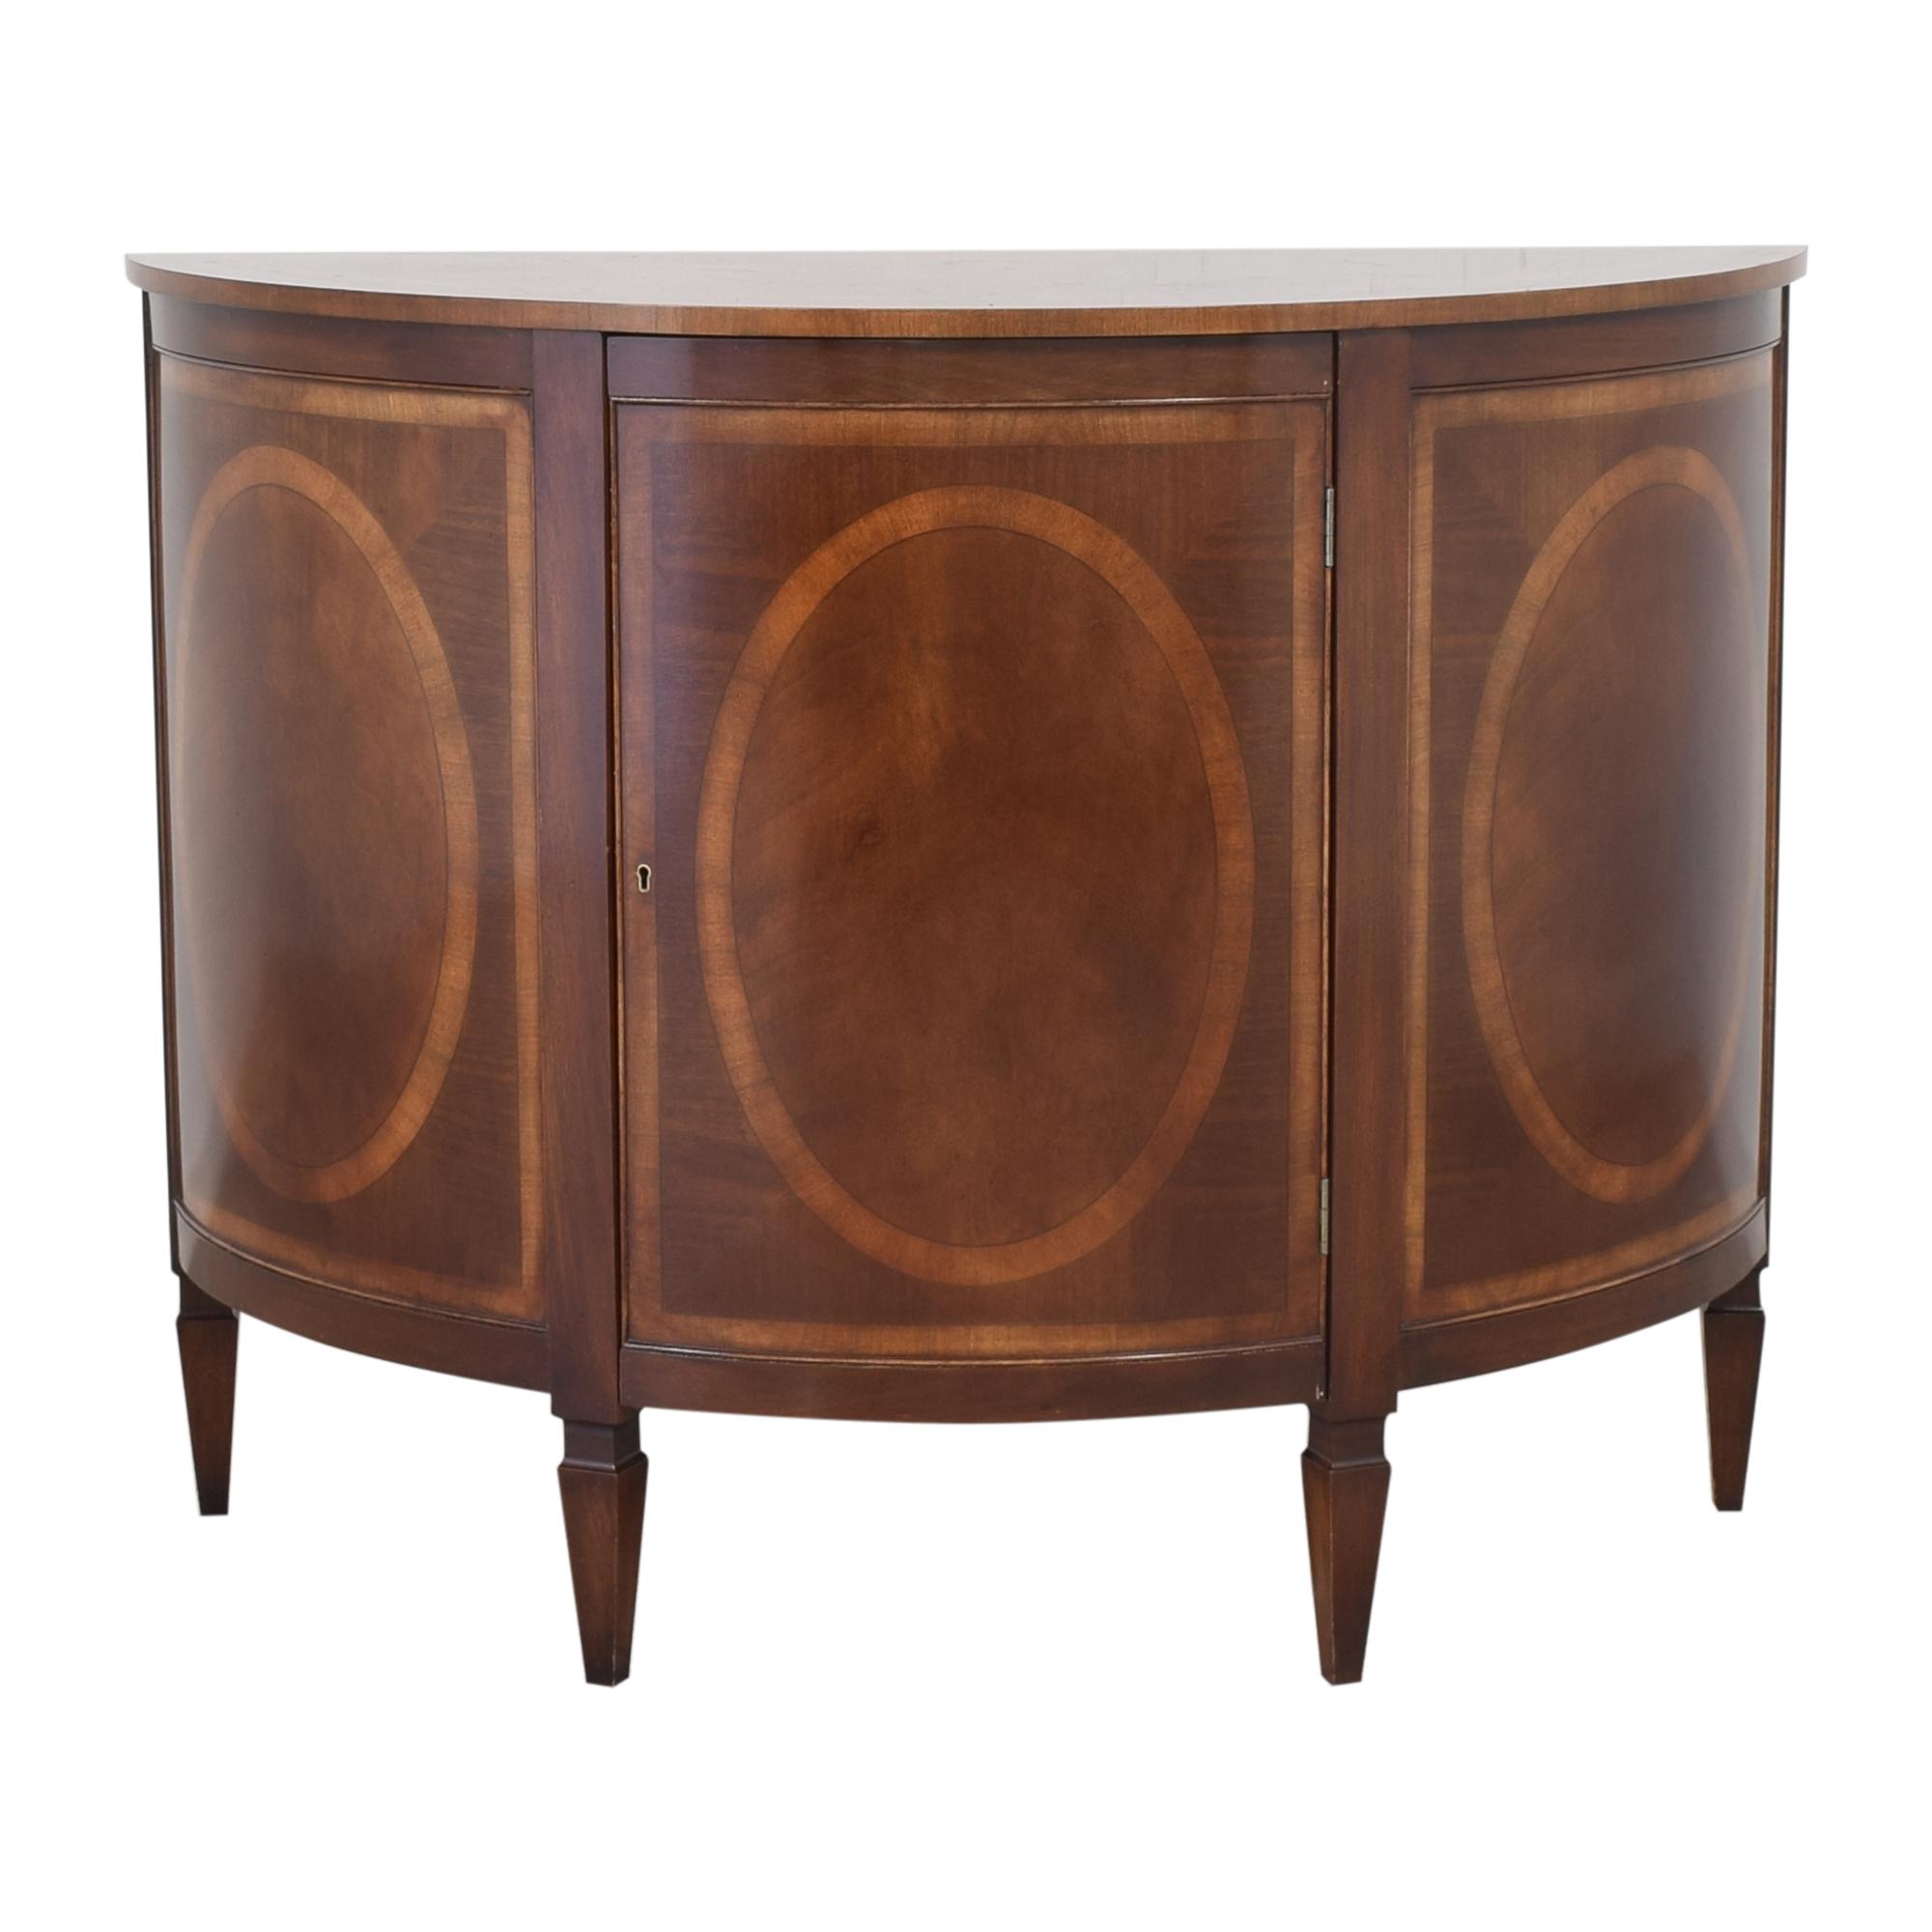 Trosby Furniture Trosby Furniture Demilune Console used